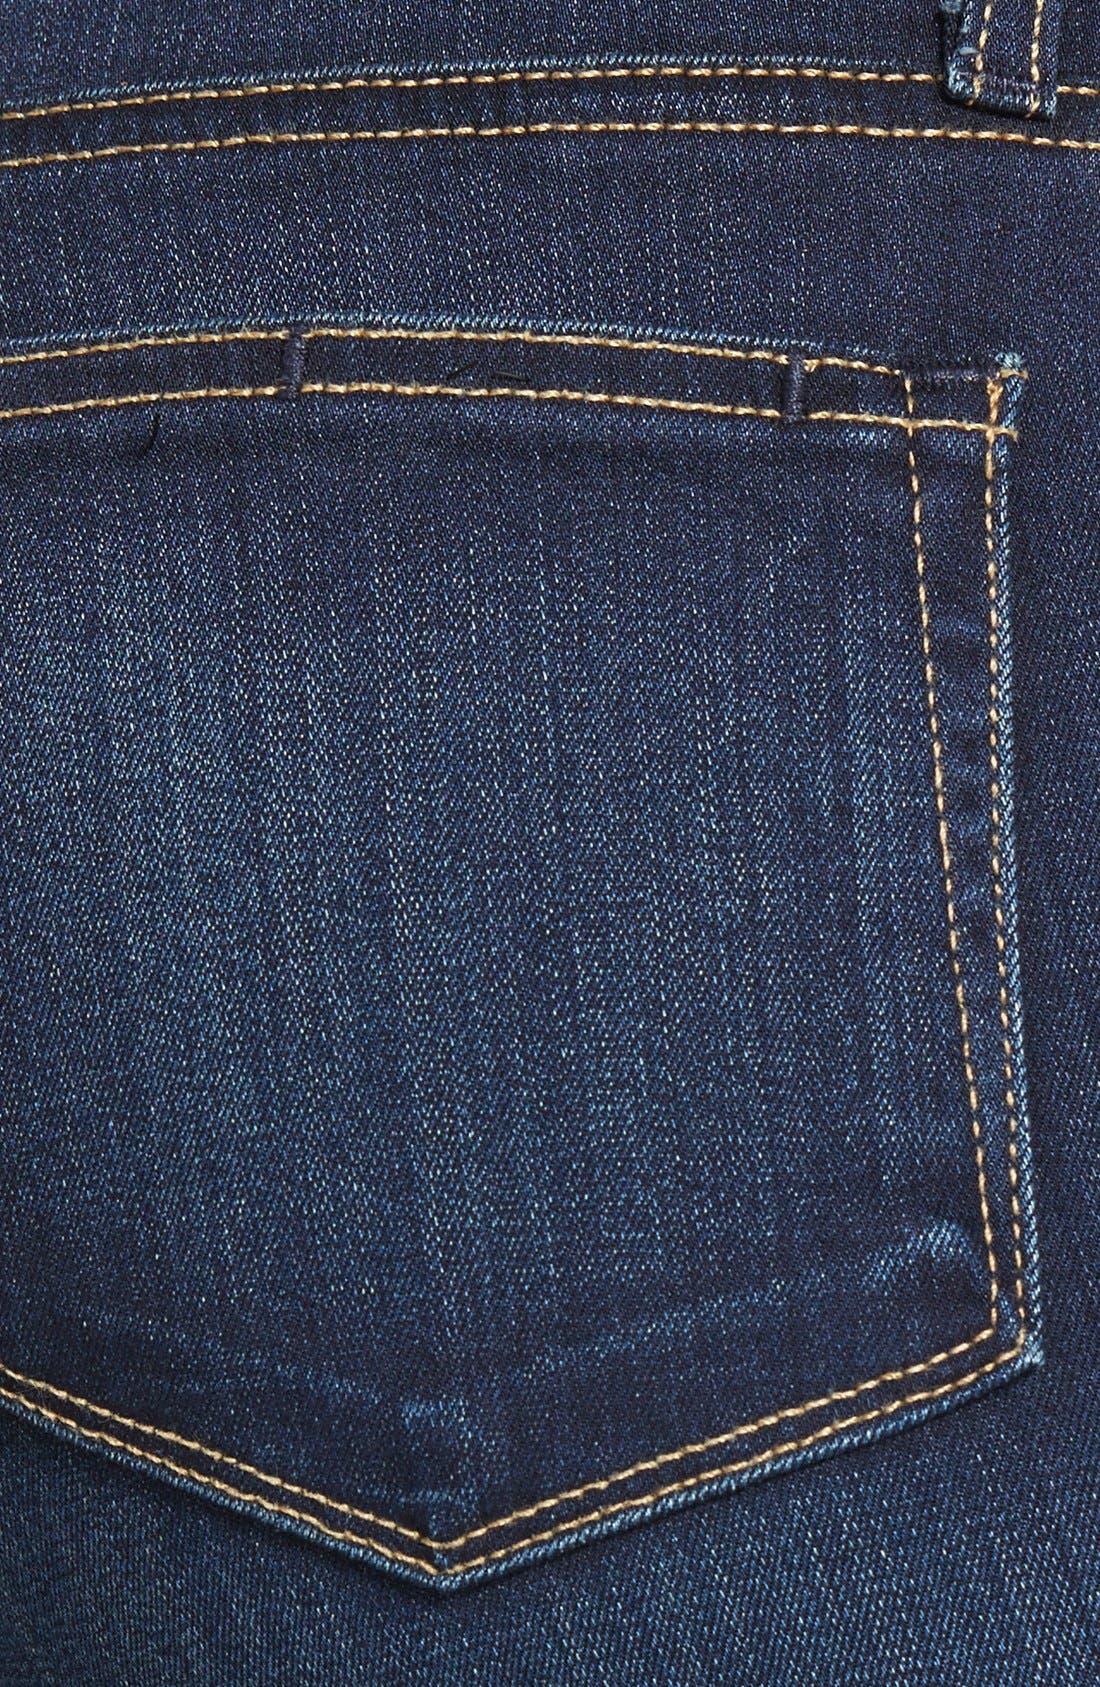 Alternate Image 3  - PAIGE Transcend - Hoxton High Waist Skinny Jeans (Vista)